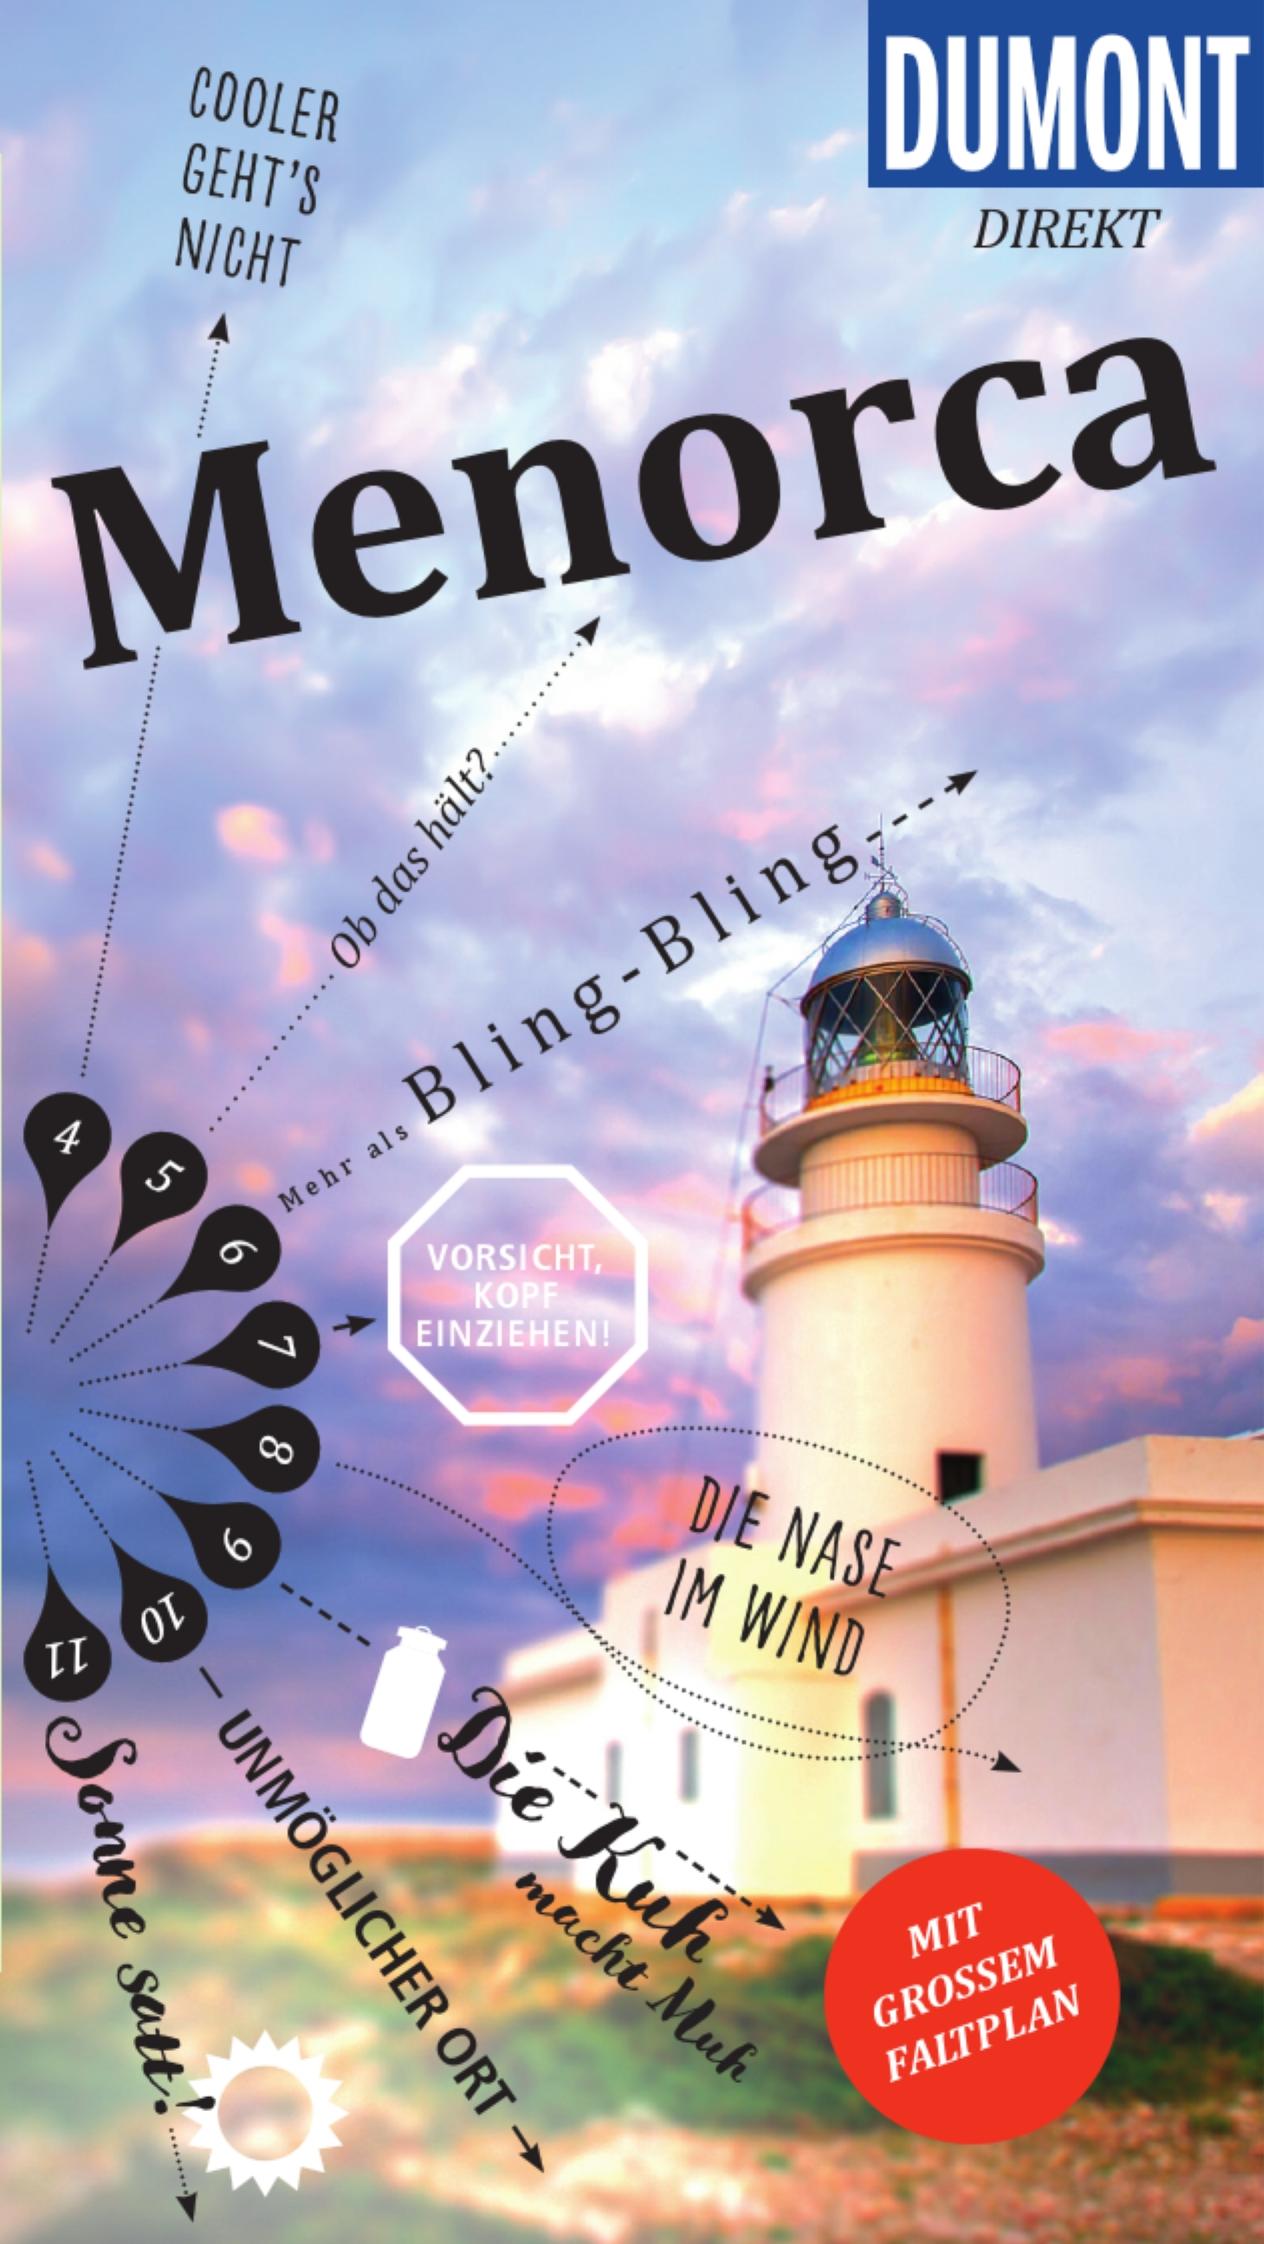 DuMont Direkt - Menorca(Cover)